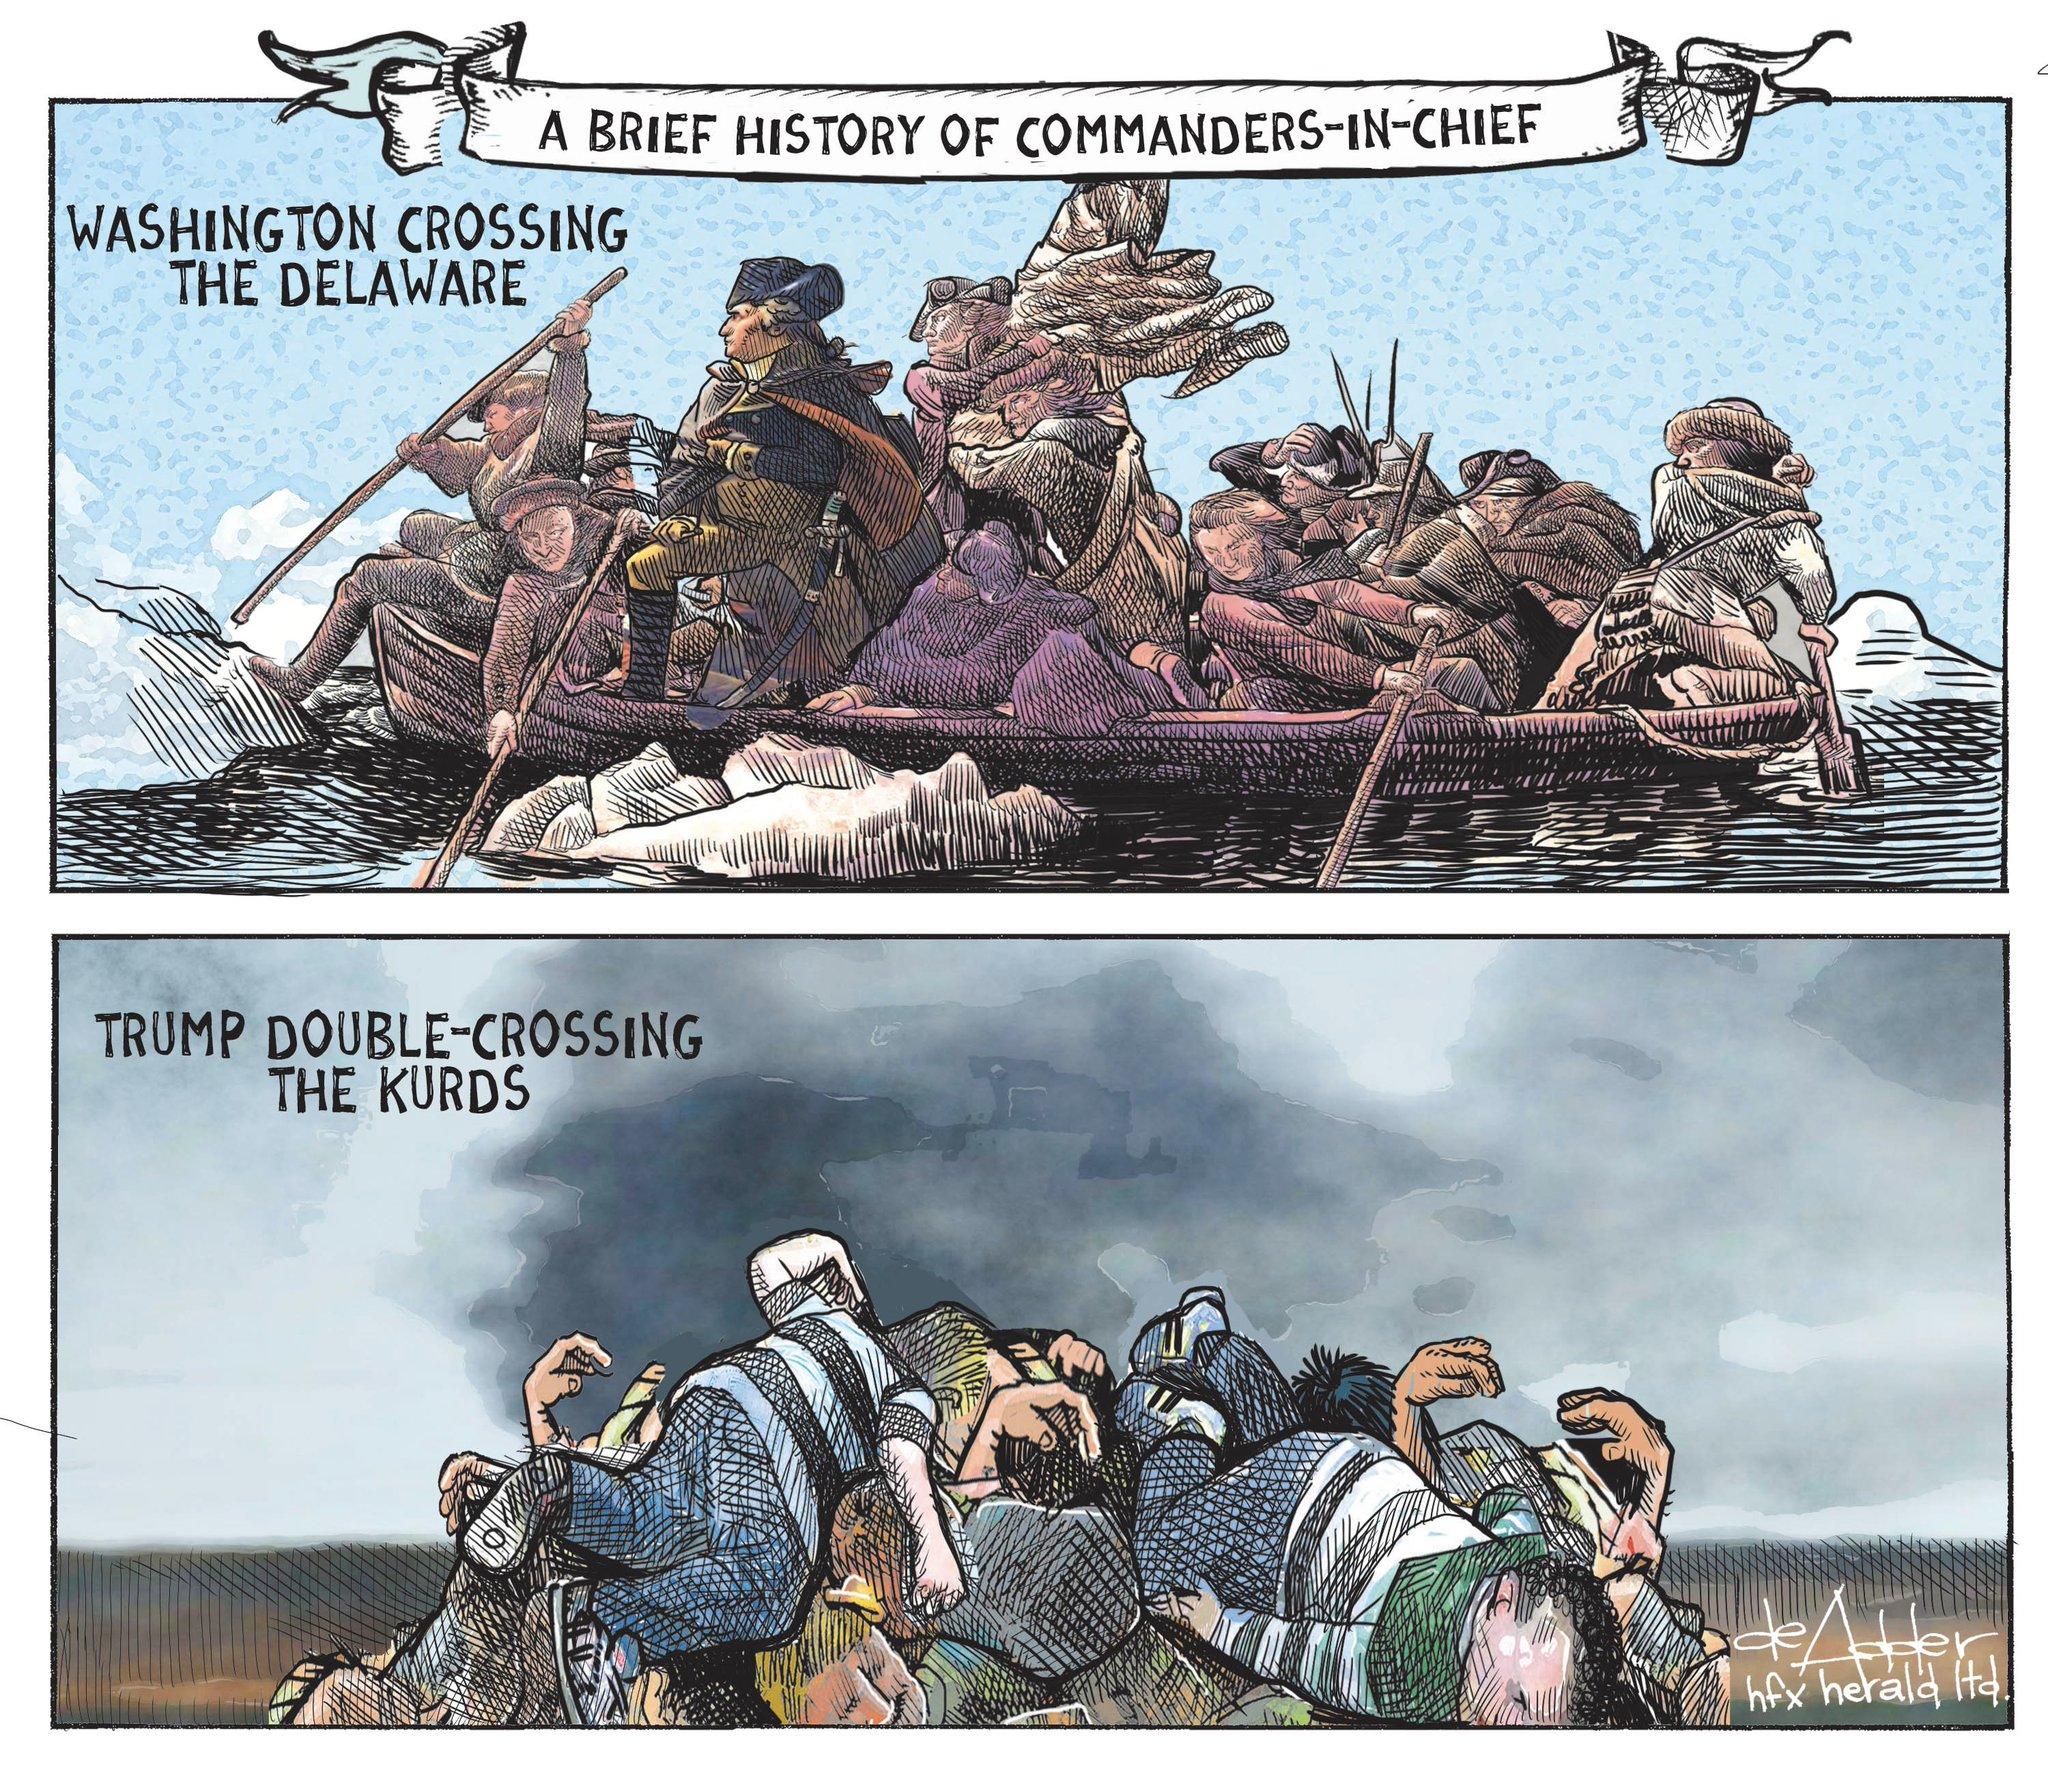 Cartoon for @chronicleherald #Trump #Kurds #KurdsBetrayedByTrump #KurdsBetrayed #uspoli https://t.co/x1Yxvh7G1u